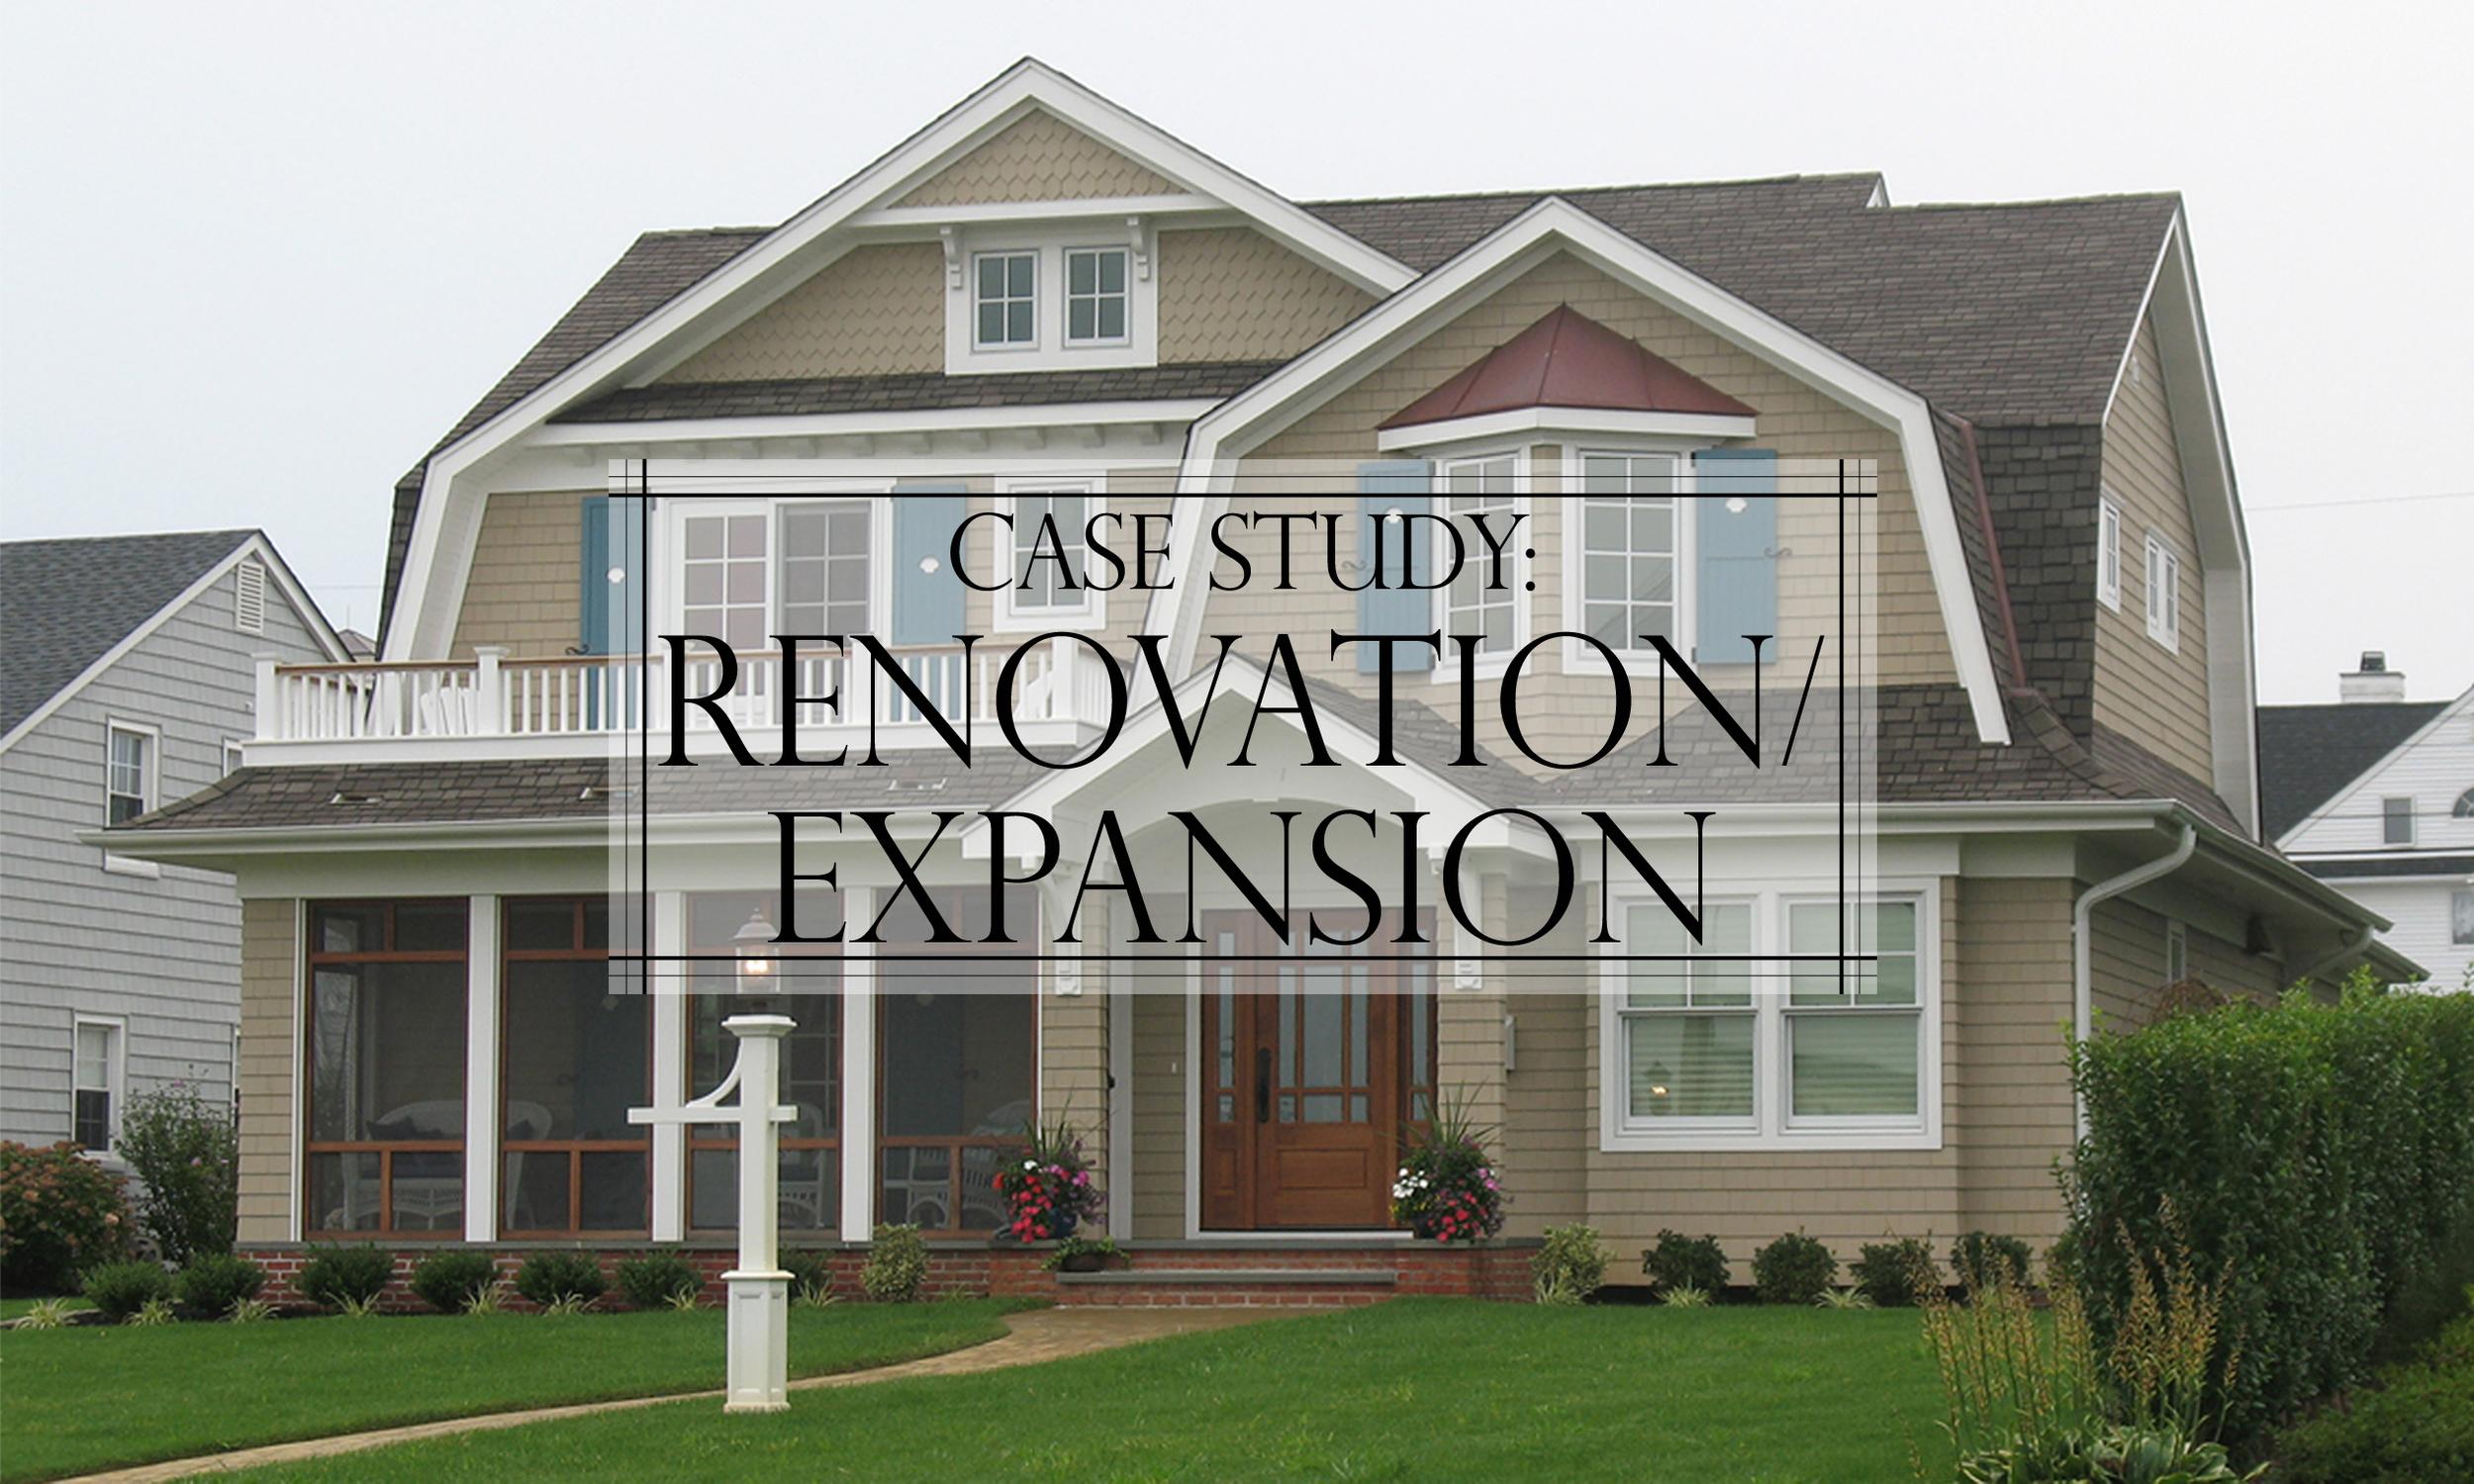 renovation expansion title pic copy.jpg